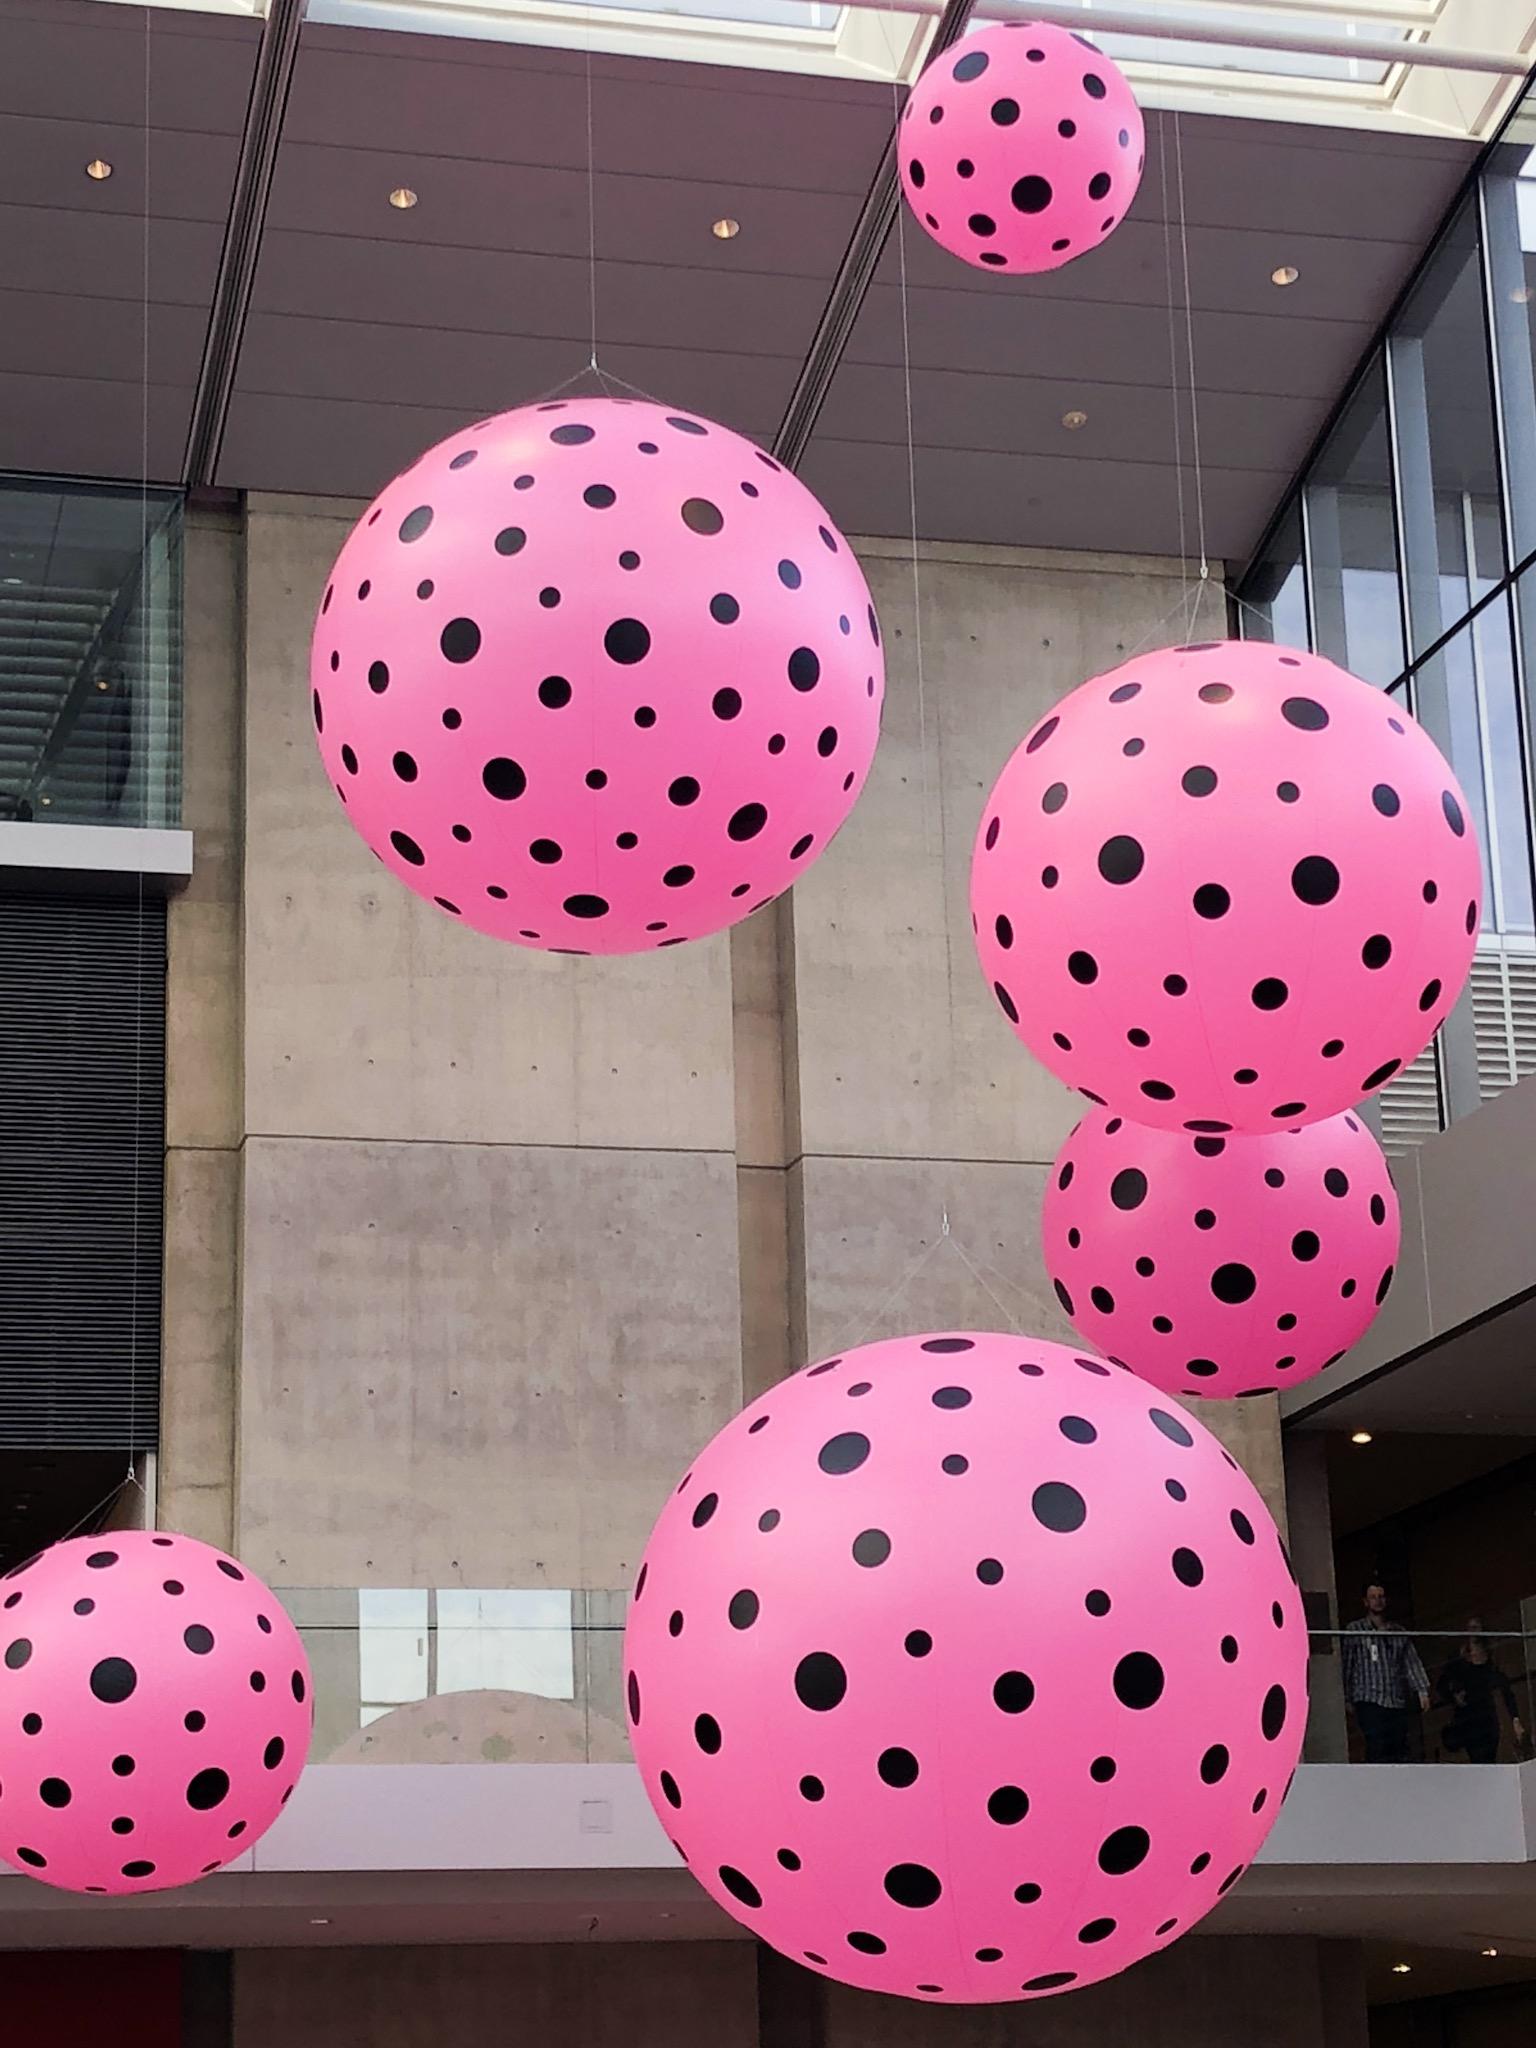 Yayoi Kusama Infinity Mirrors Polka Dots